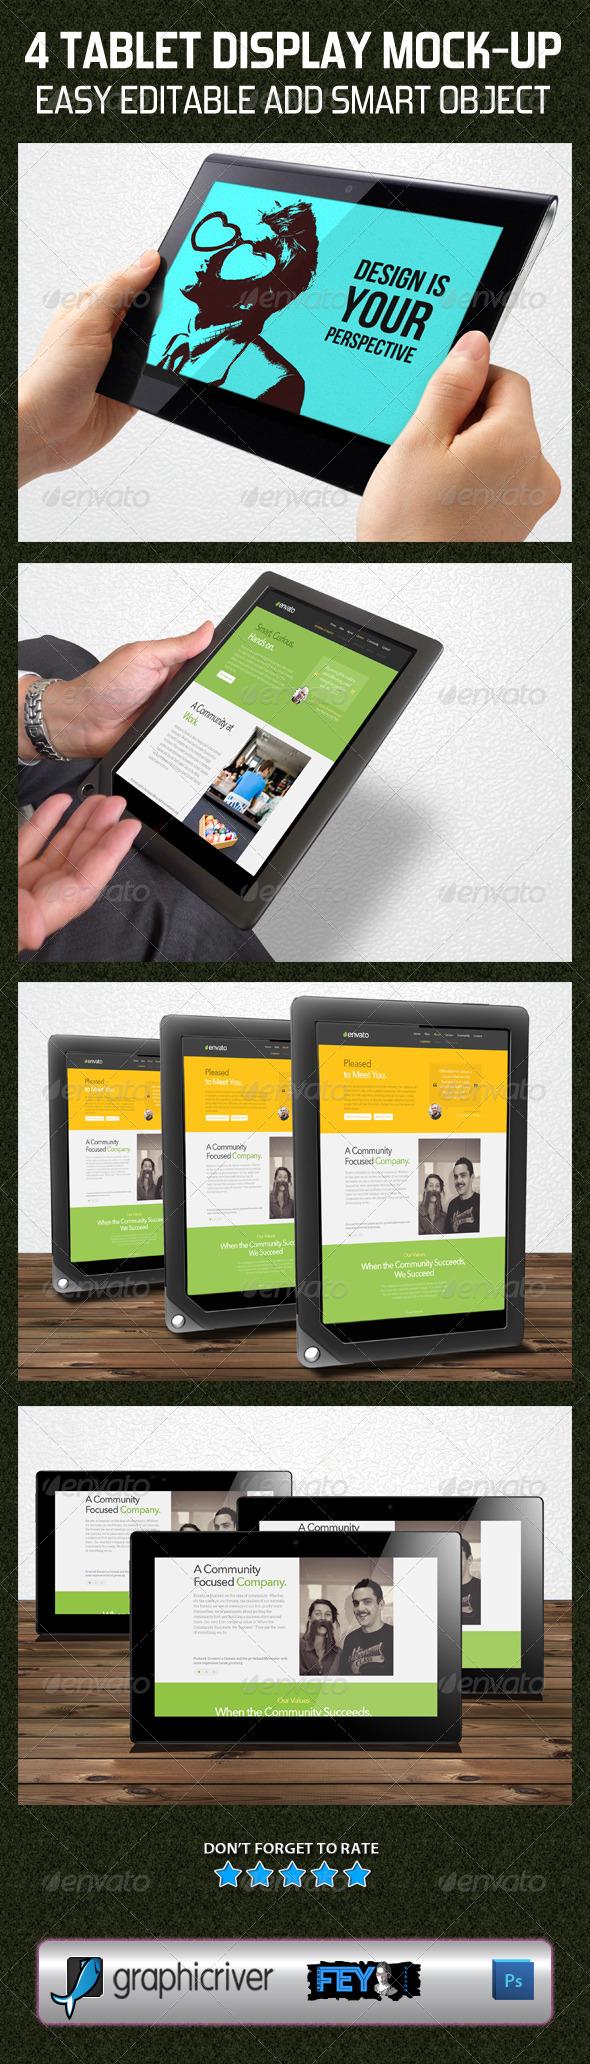 GraphicRiver 4 Tablet Display Mock-Up 5789065